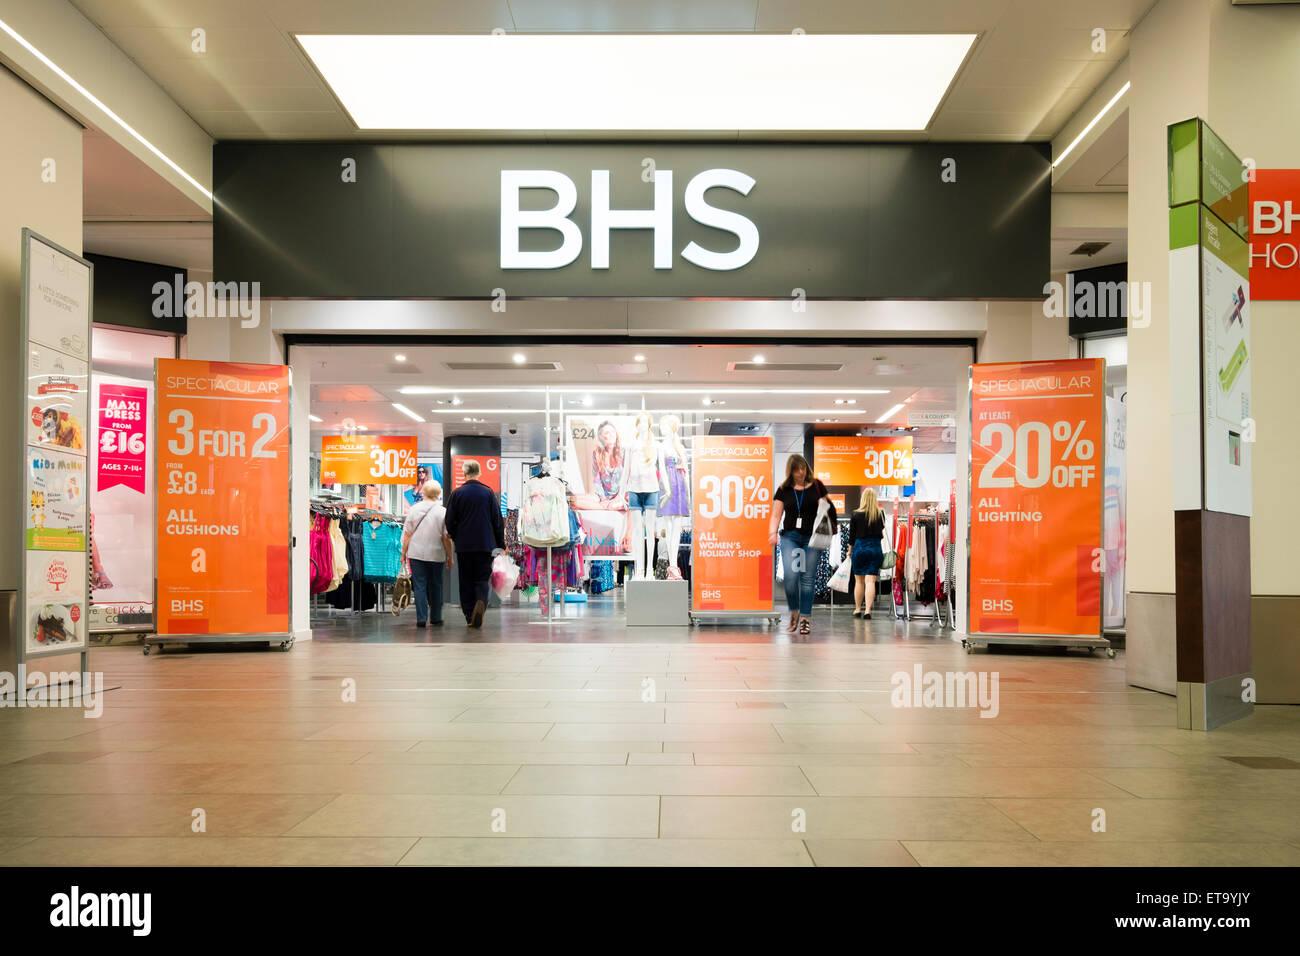 BHS store, UK. - Stock Image